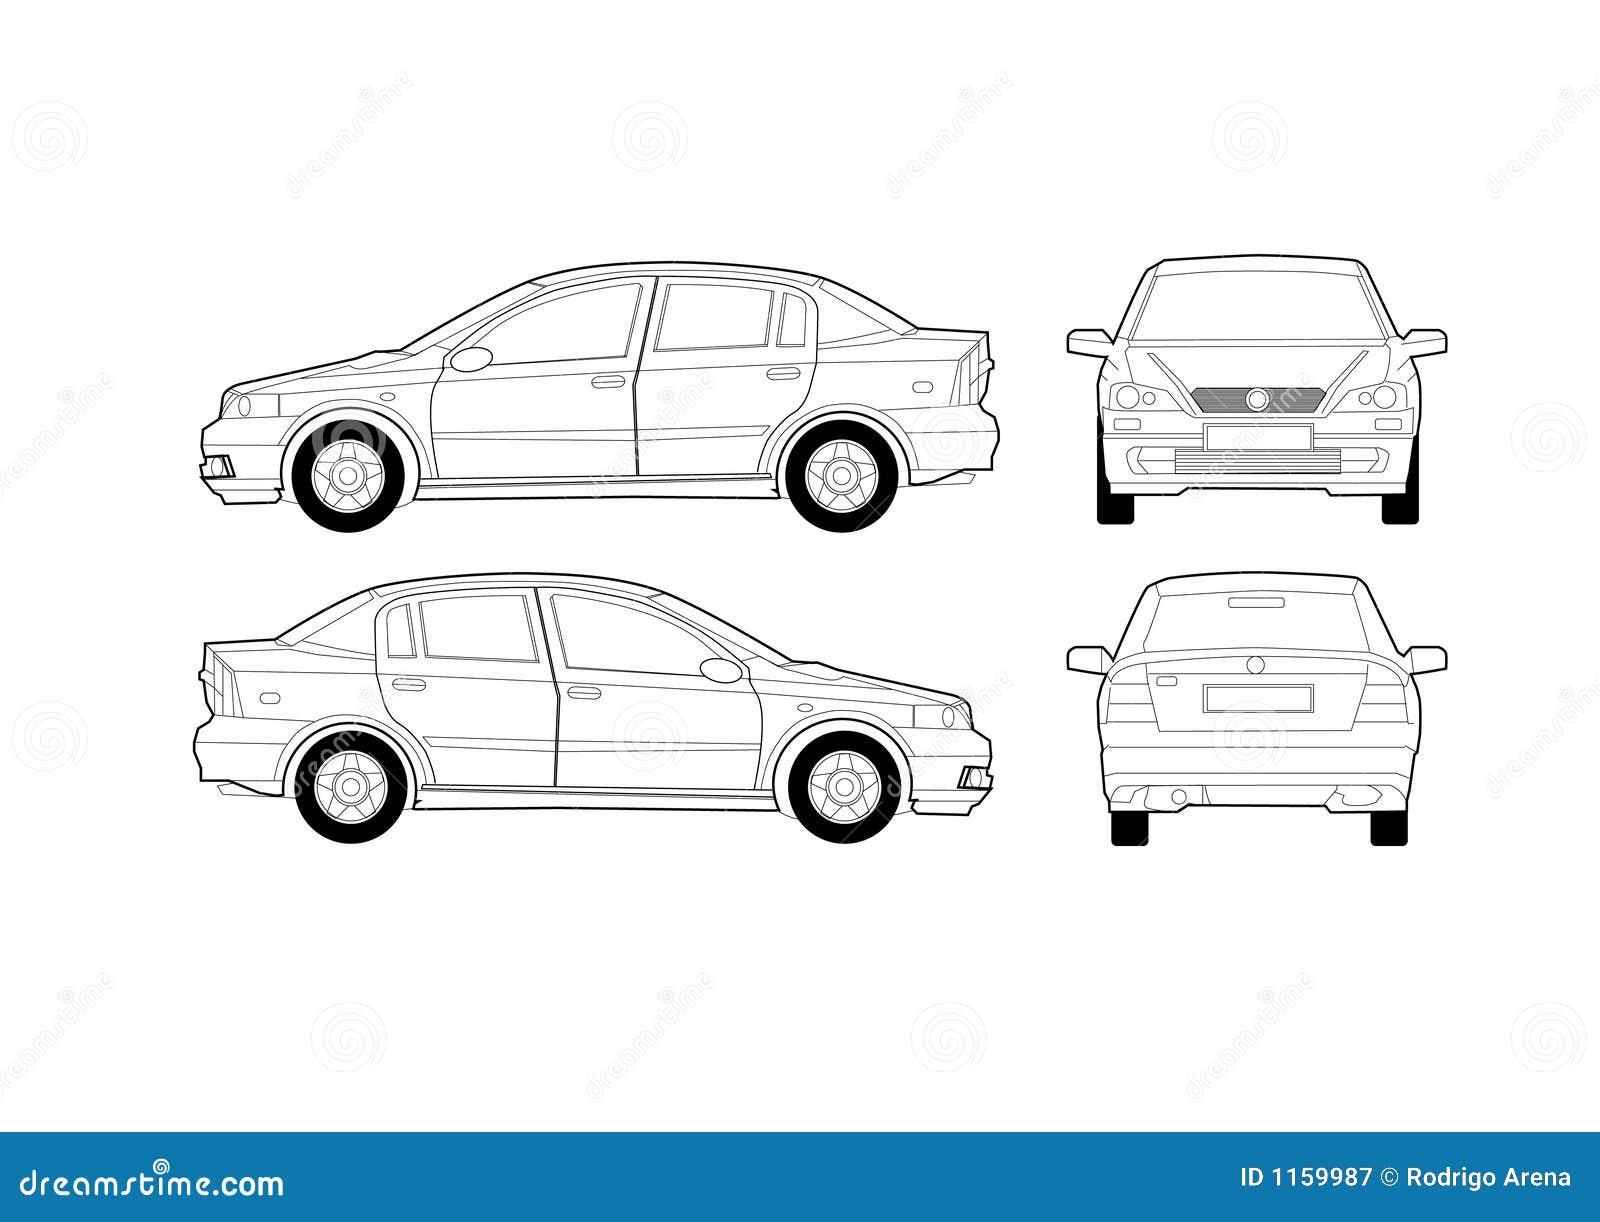 Interior car body parts names 12